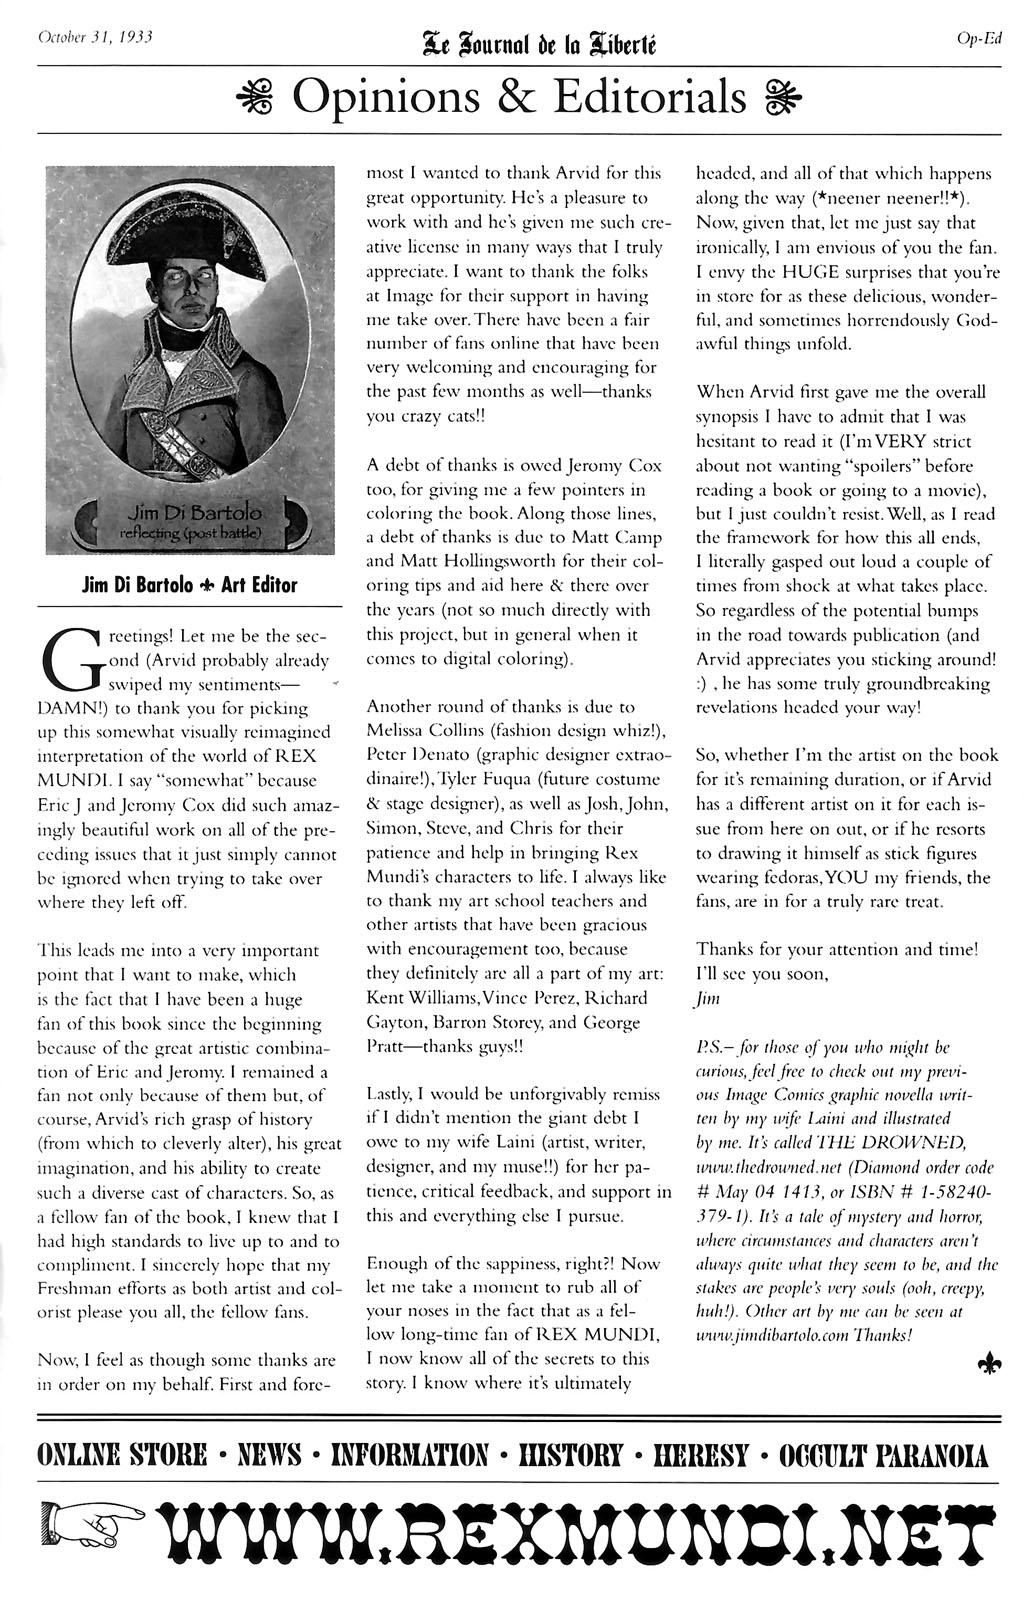 Read online Rex Mundi comic -  Issue #14 - 29